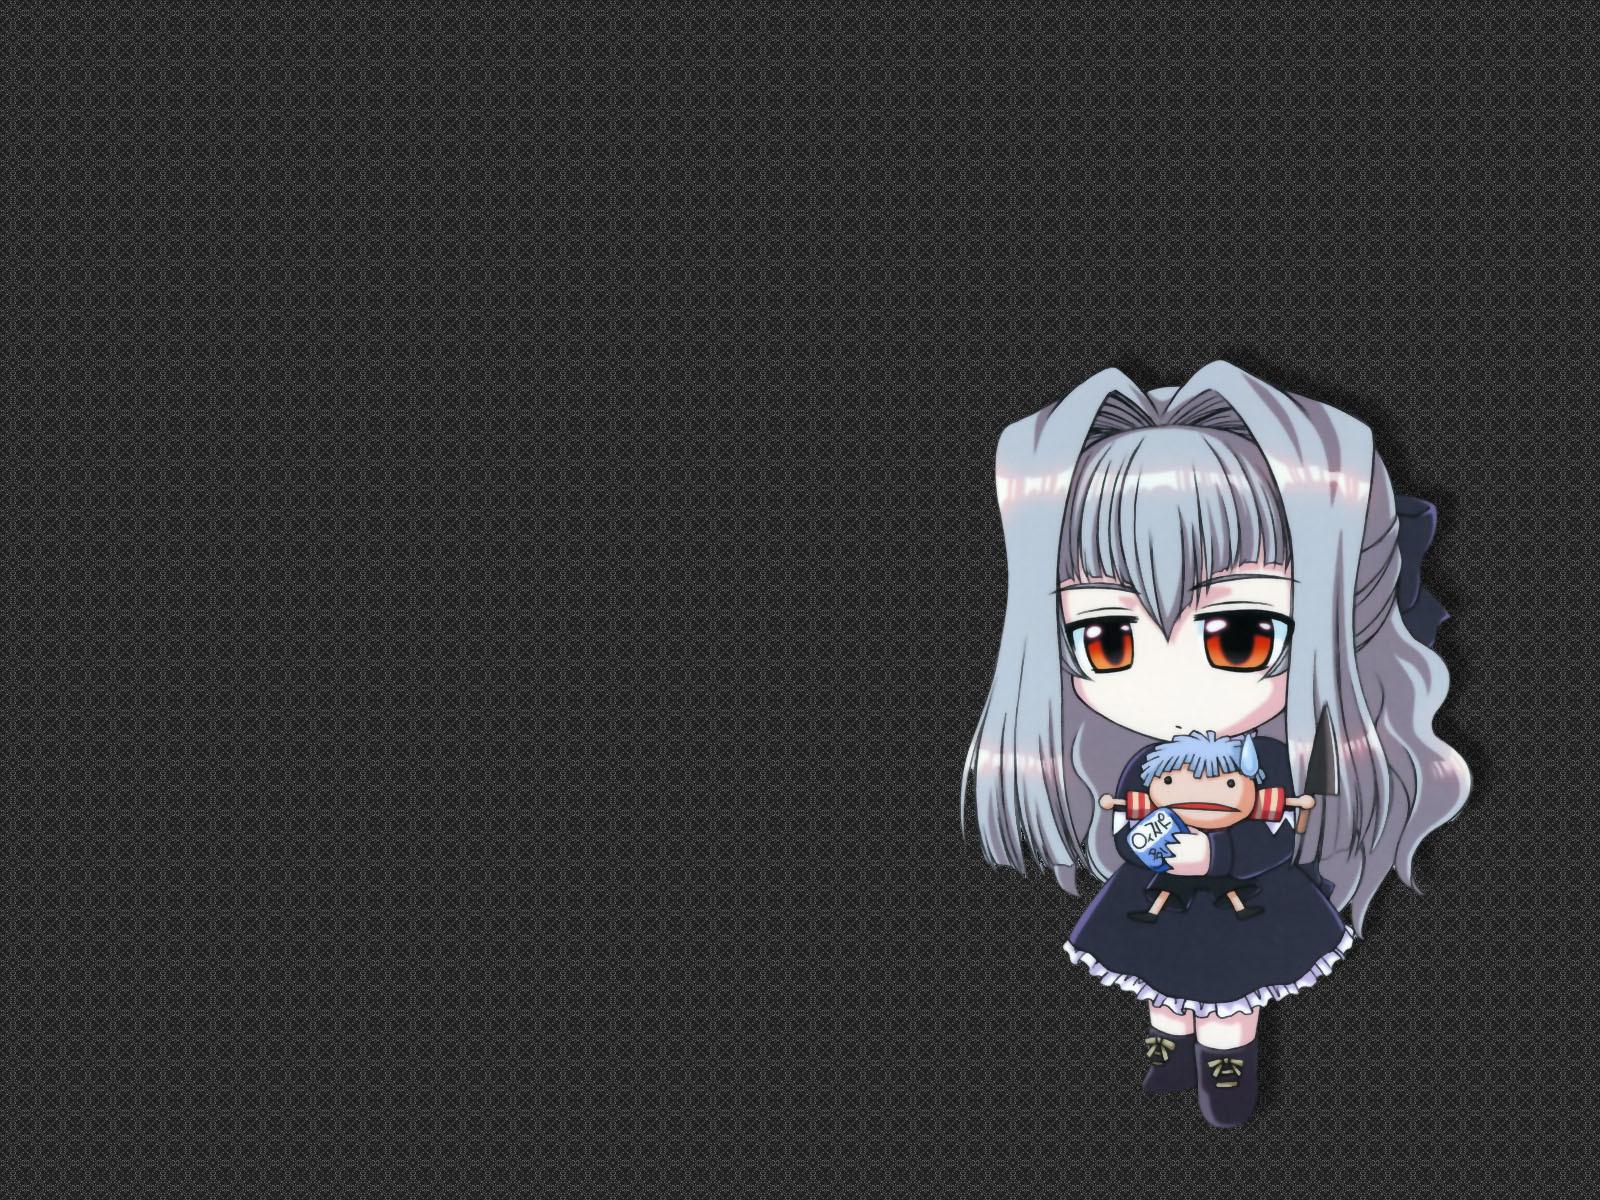 ... - Chibi Hd Wallpaper Background Flooxs Com Anime Wallpaper Chibi Hd Gaara And Naruto Chibi